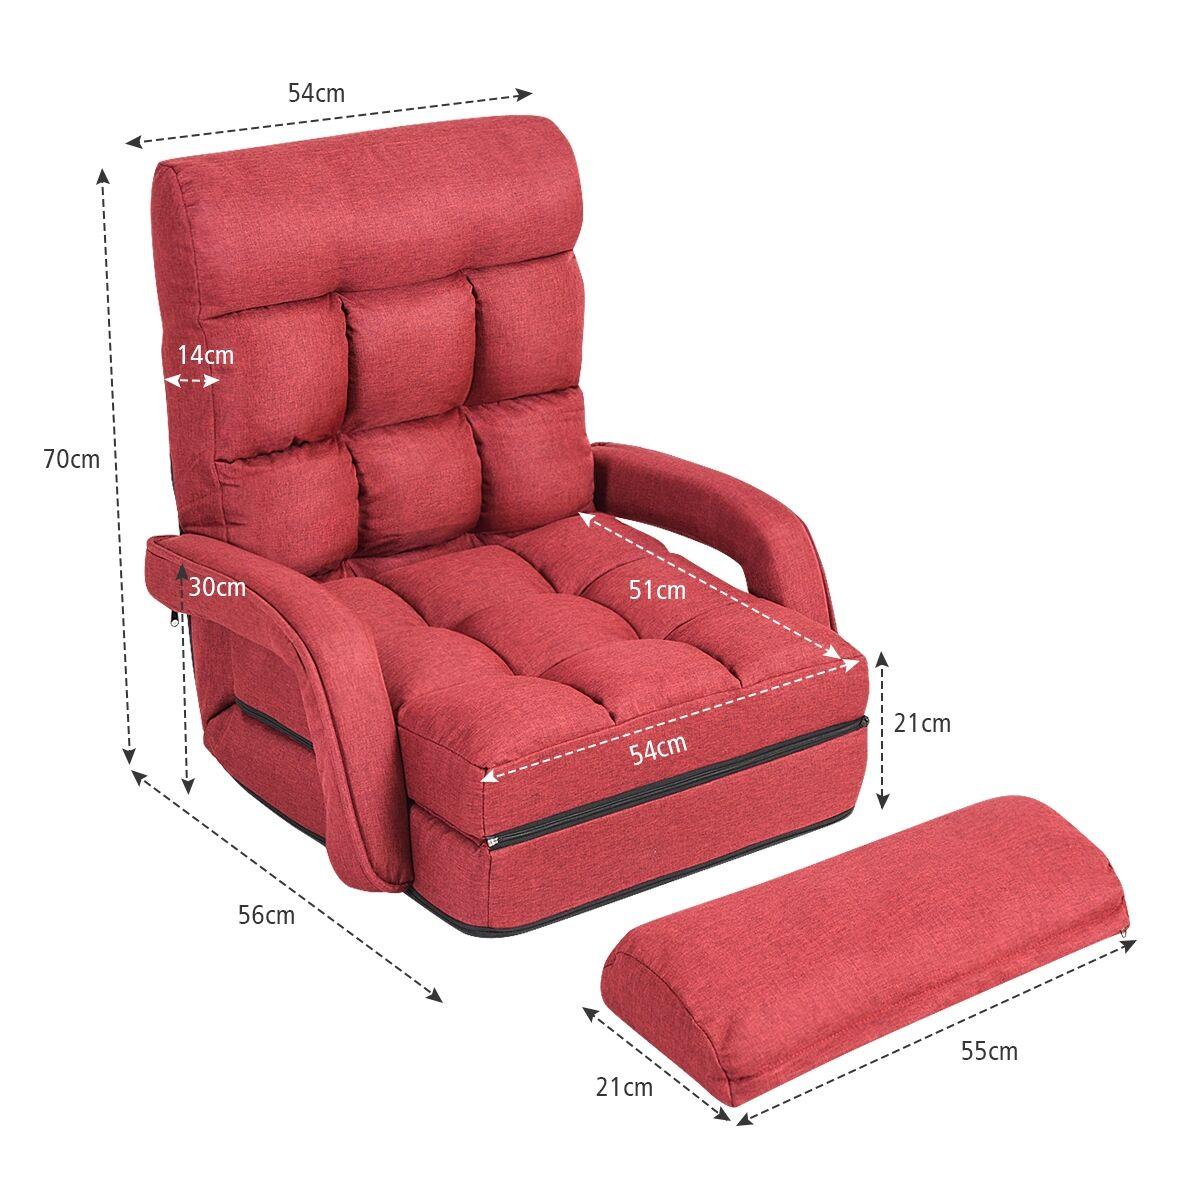 Costway Fauteuil Convertible Chauffeuse Convertible 1 Place en Tissu avec Oreiller 5 Positions Rouge